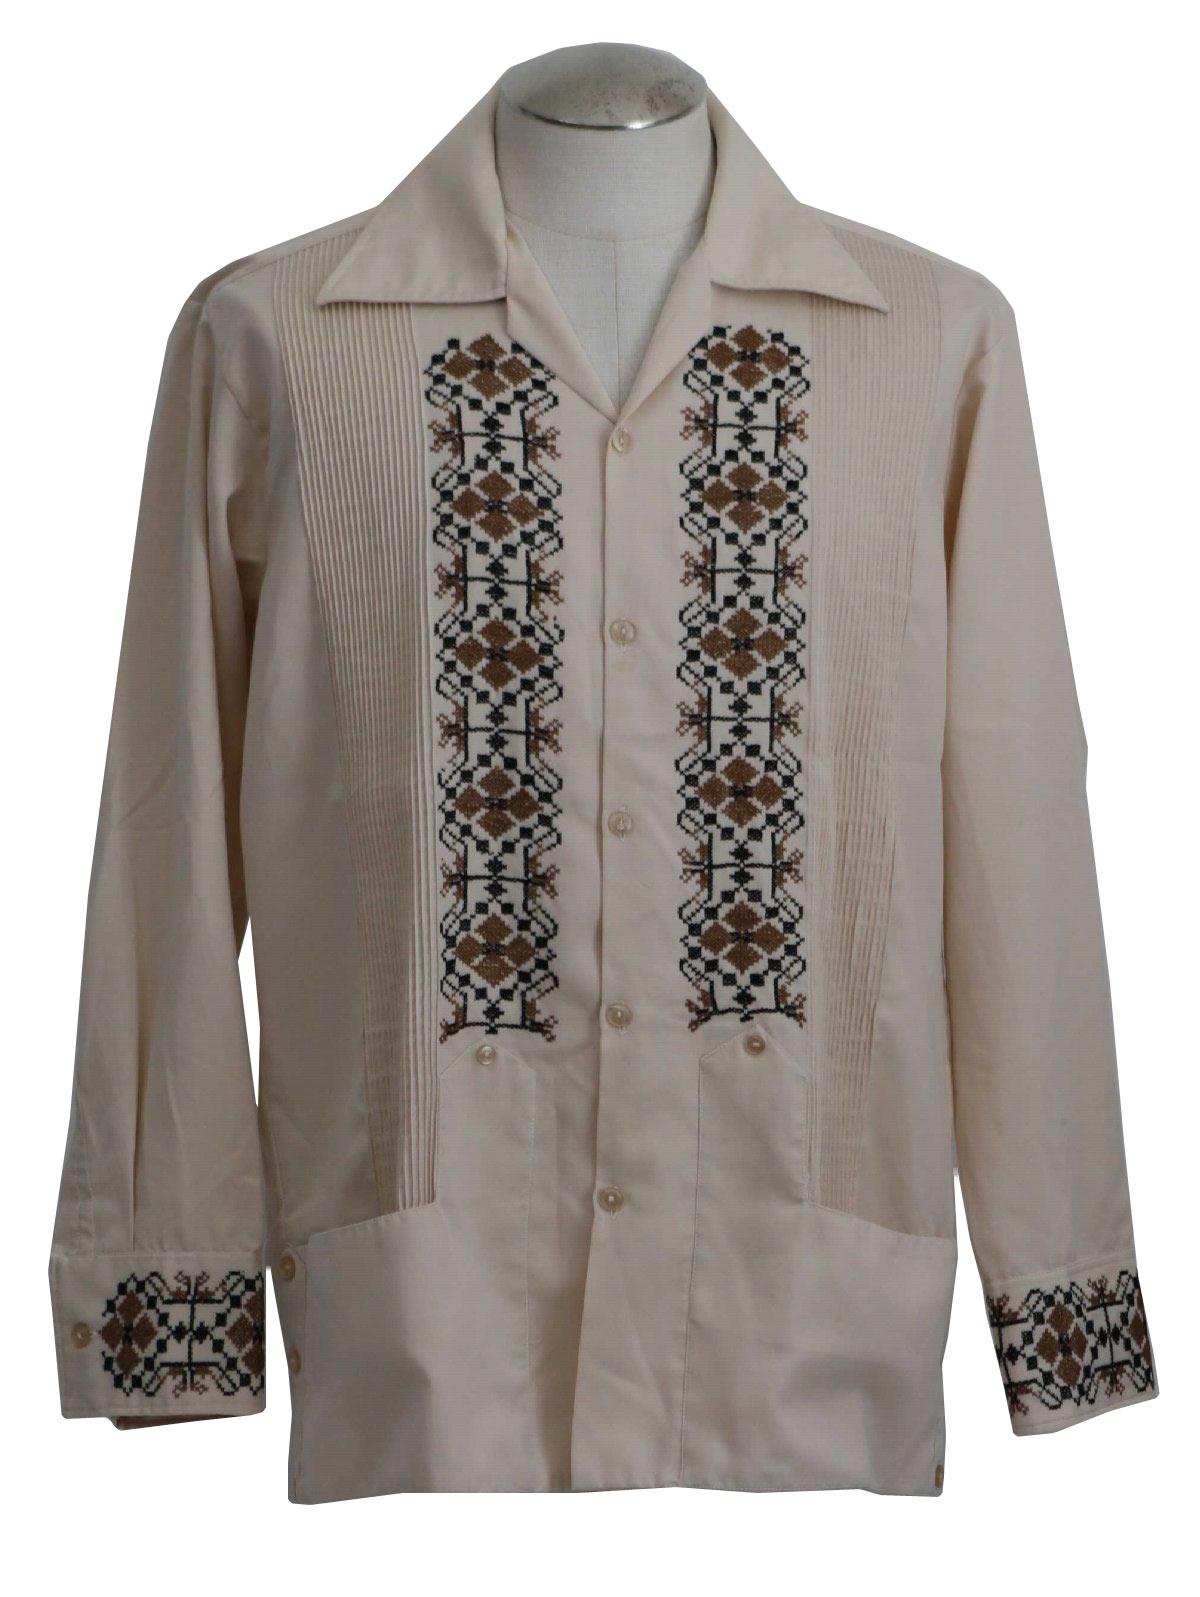 Vintage 70s Guayabera Shirt 70s Brummel Mens Creamy